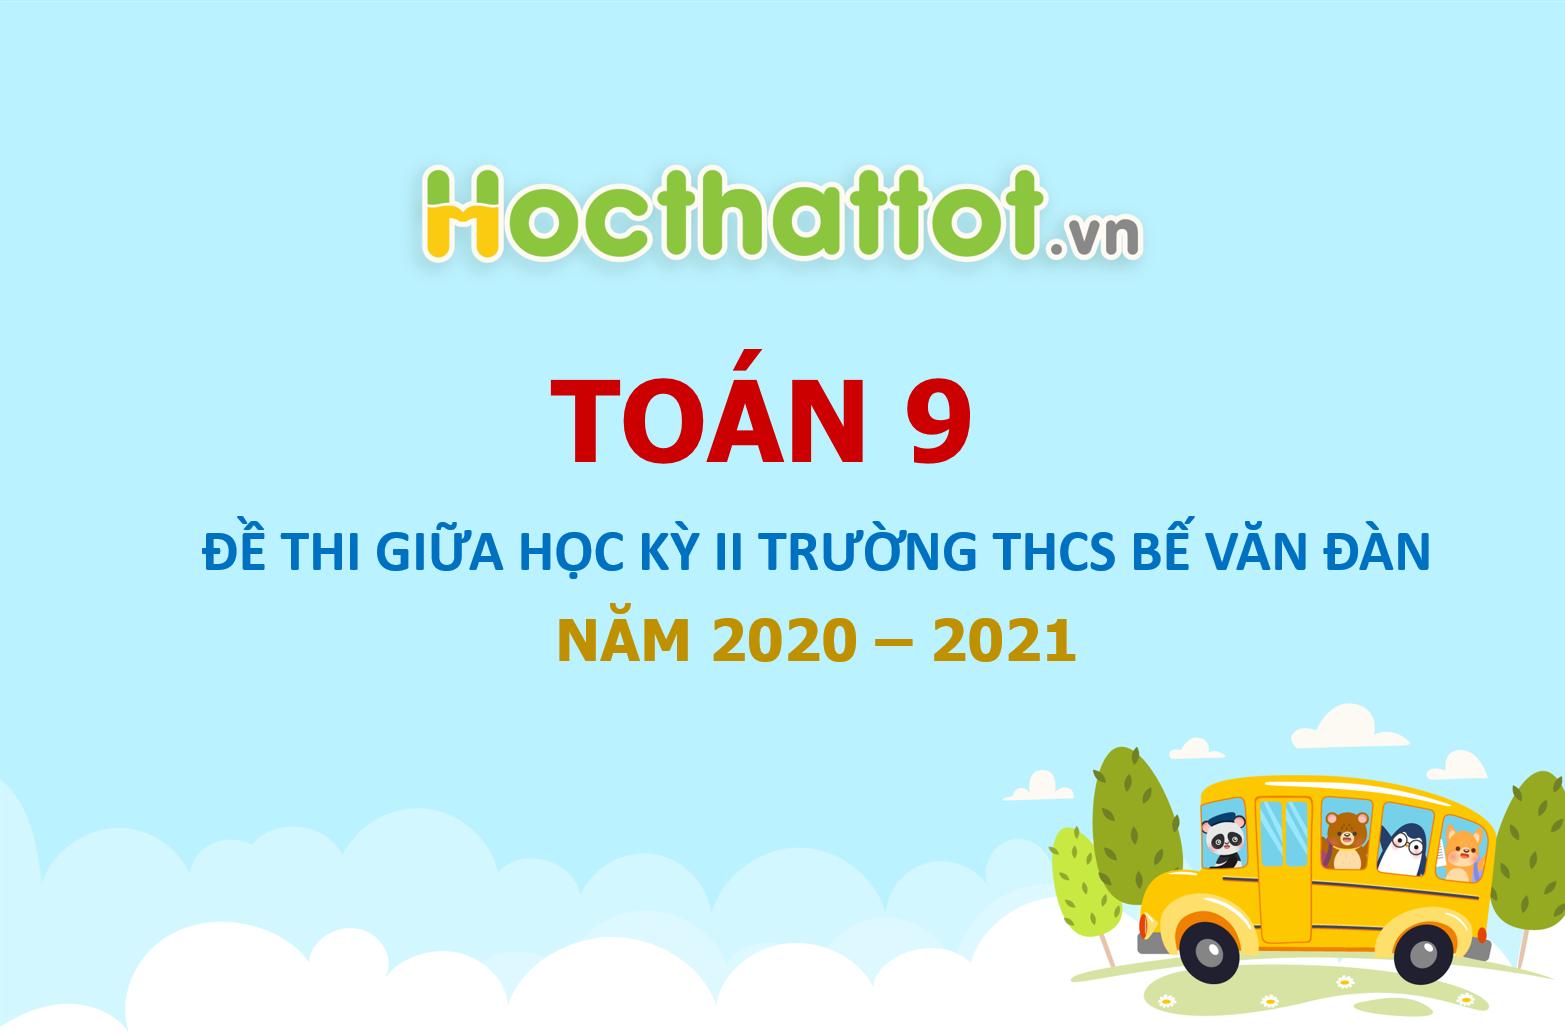 de-thi-giua-hoc-ky-2-toan-9-nam-2020-2021-truong-be-van-dan-ha-noi